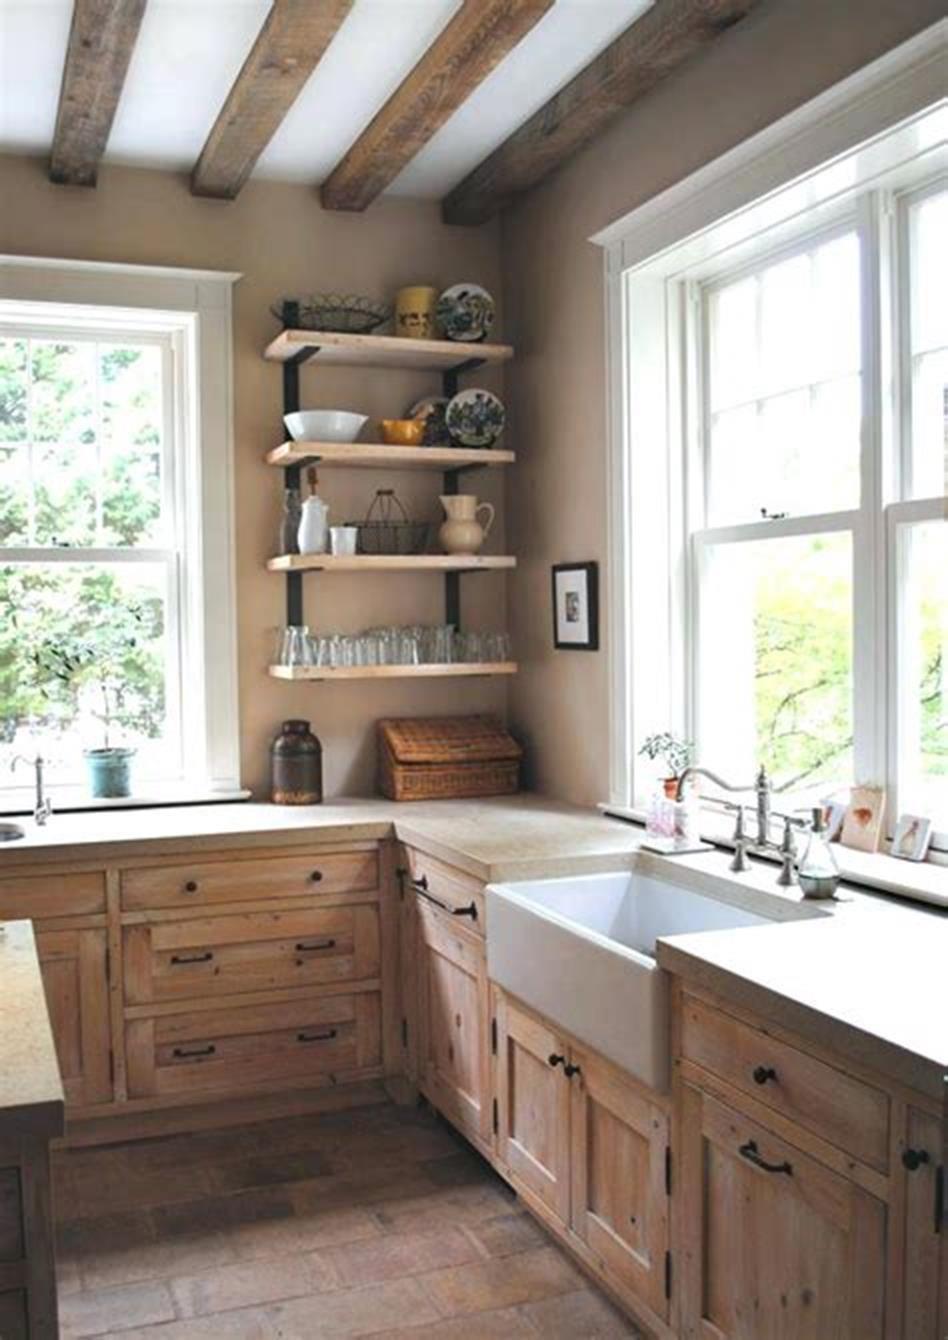 46 Most Popular Kitchen Color Schemes Trends 2019